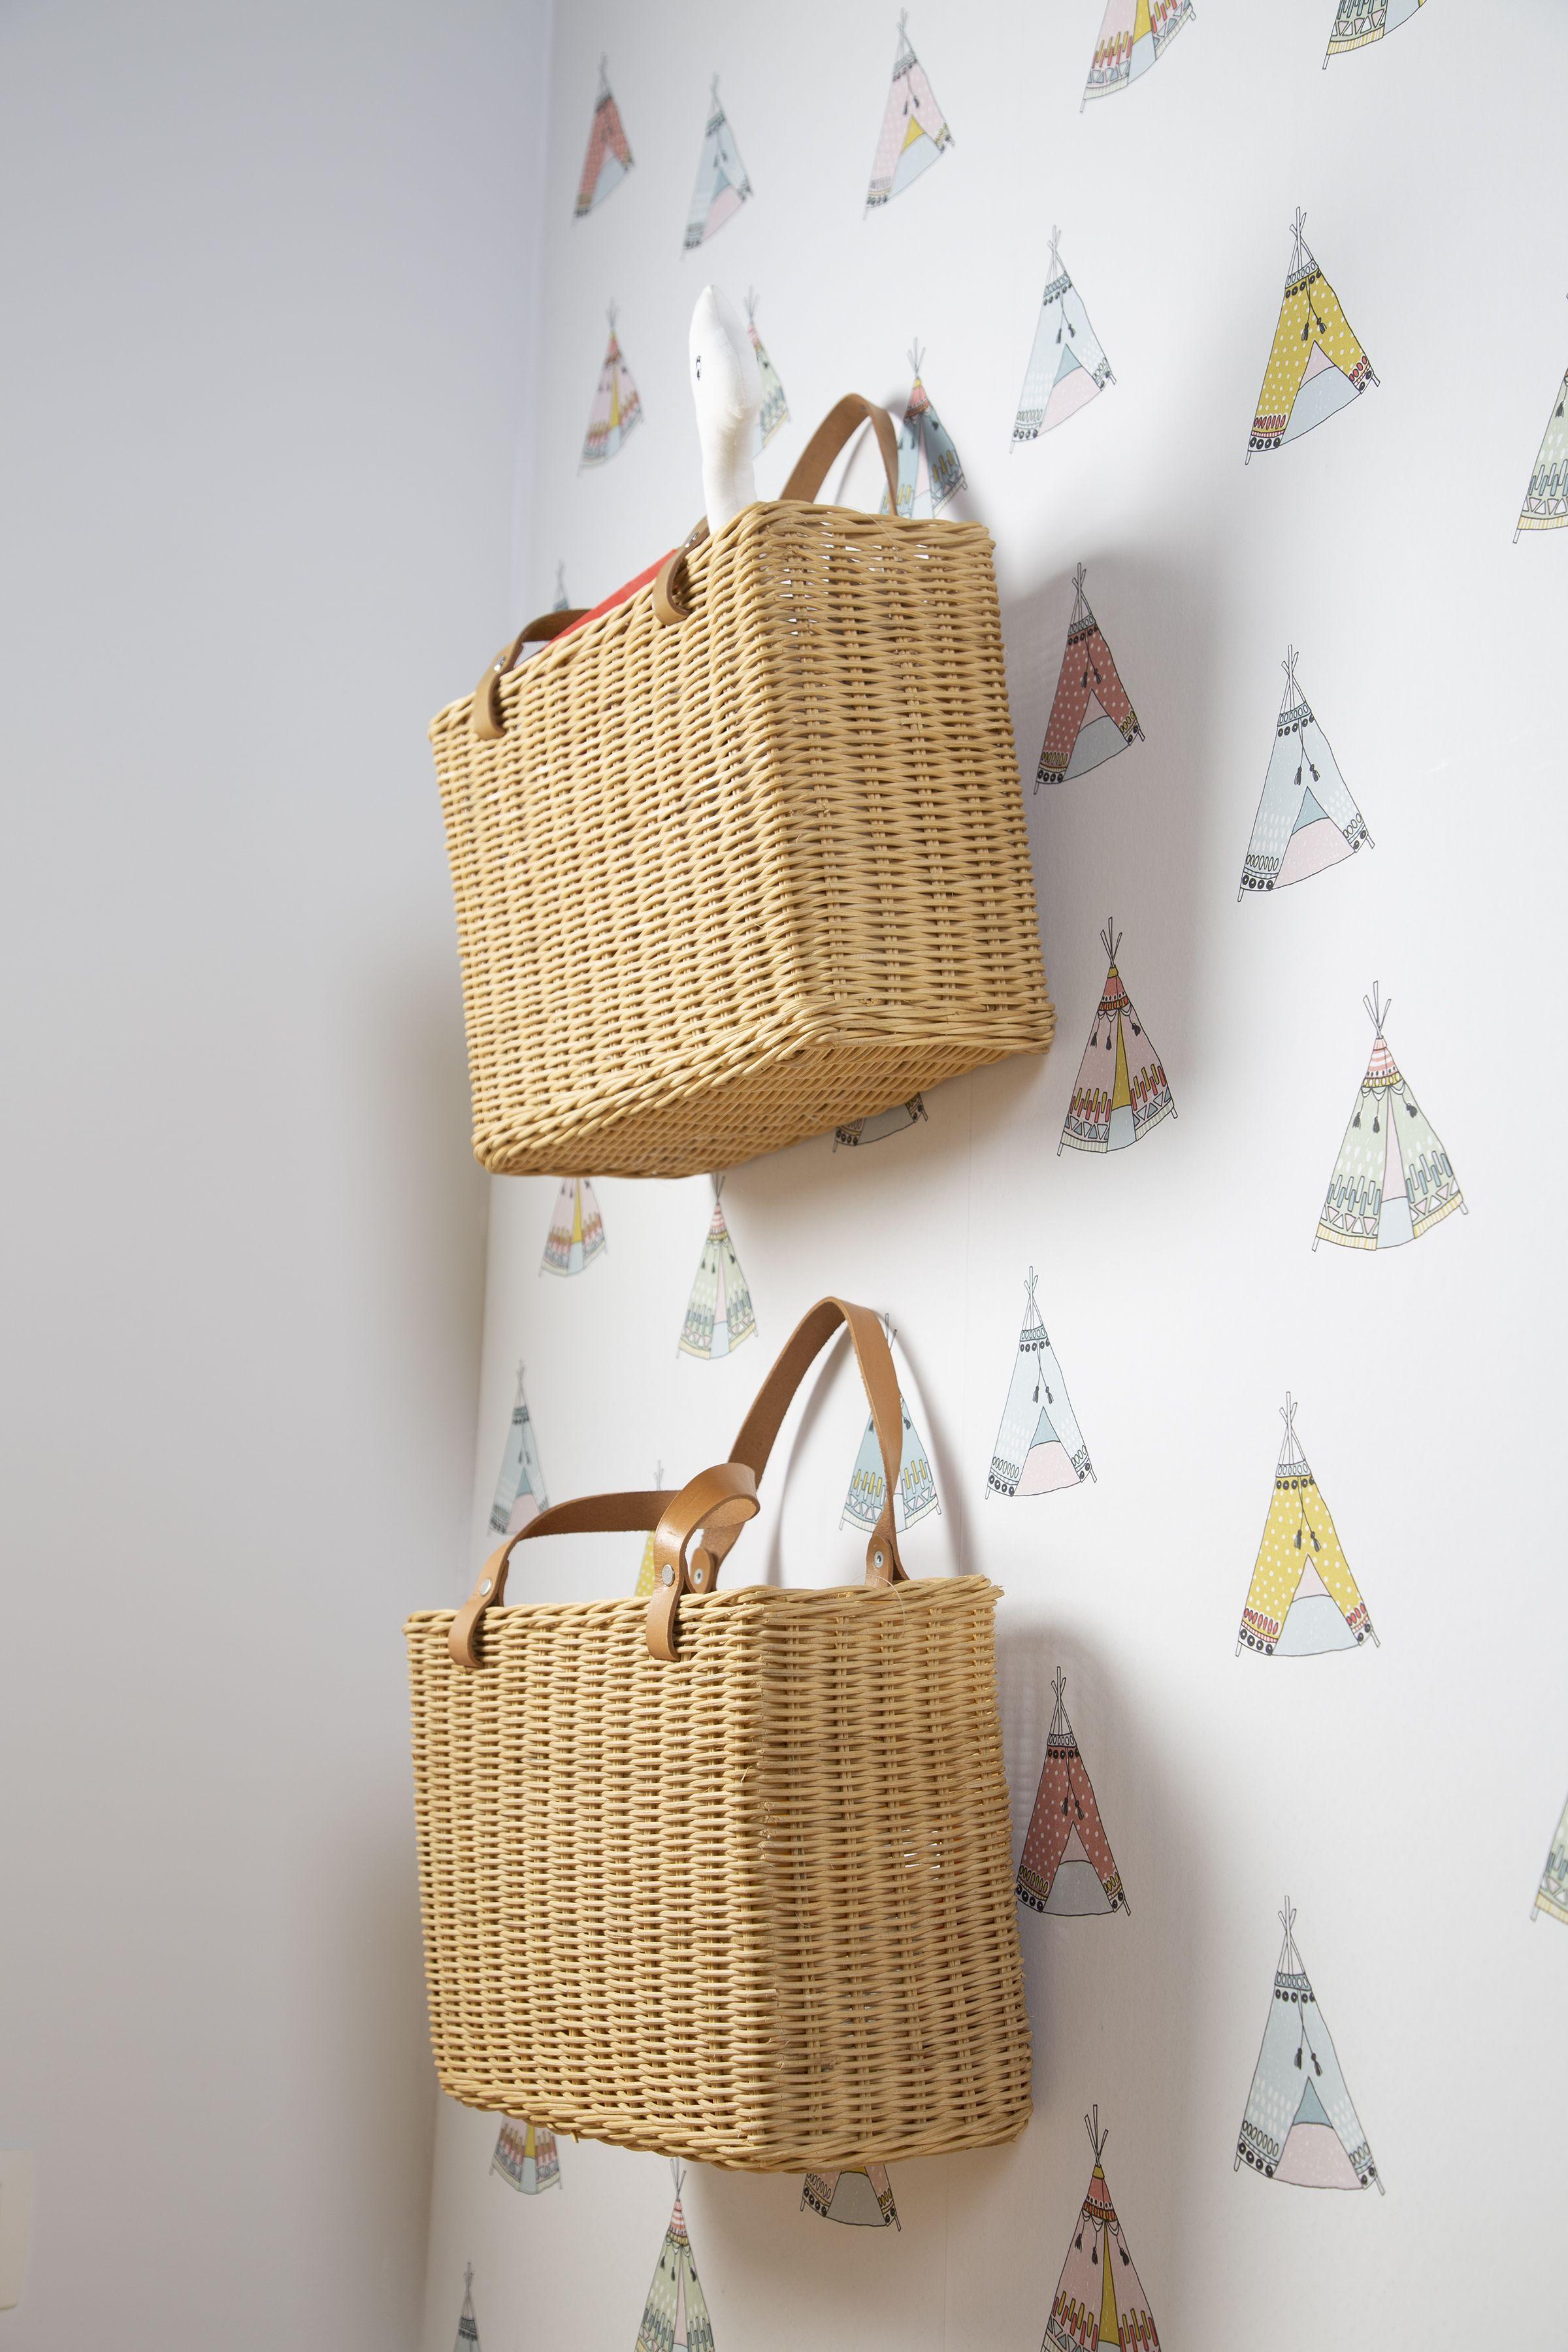 Hanging Storage Basket 2 Handles Natural In 2020 Storage Baskets Decorative Storage Baskets Hanging Storage